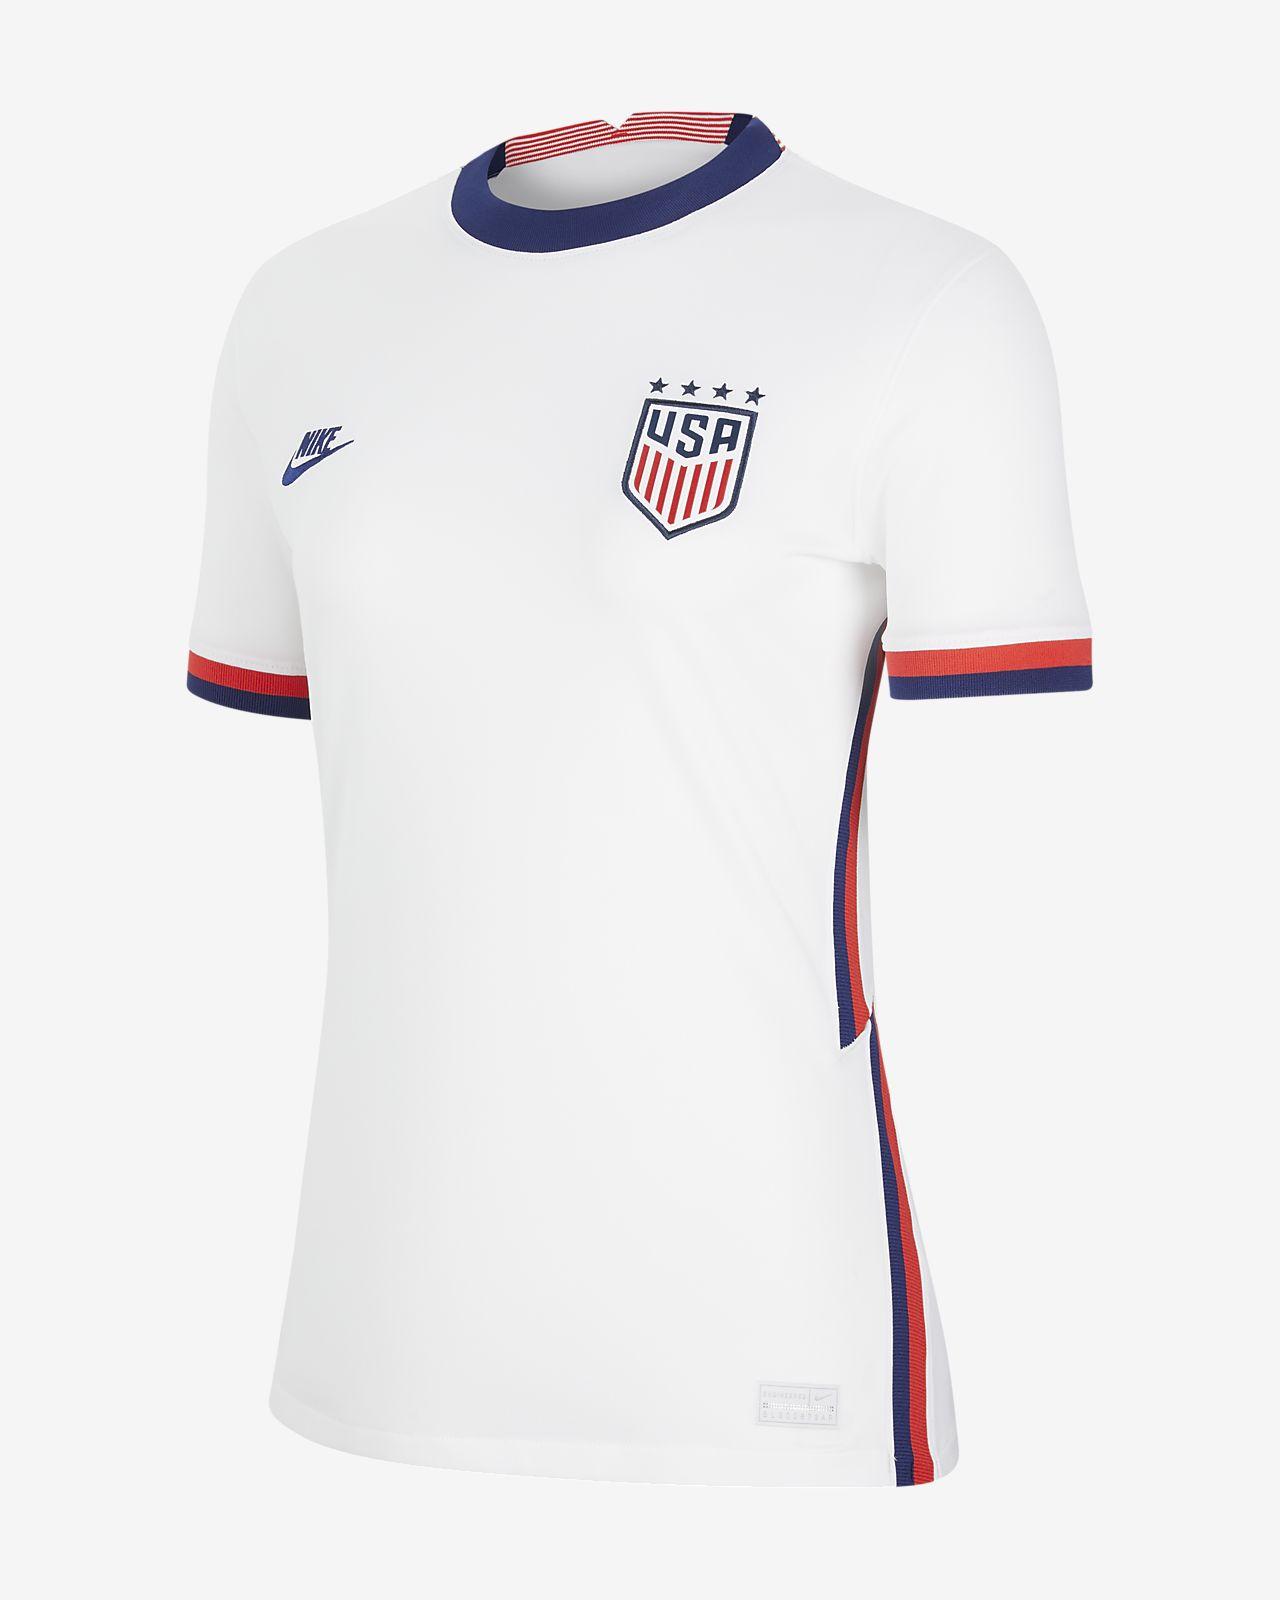 U.S. 2020 Stadium Home (4-Star) Women's Soccer Jersey